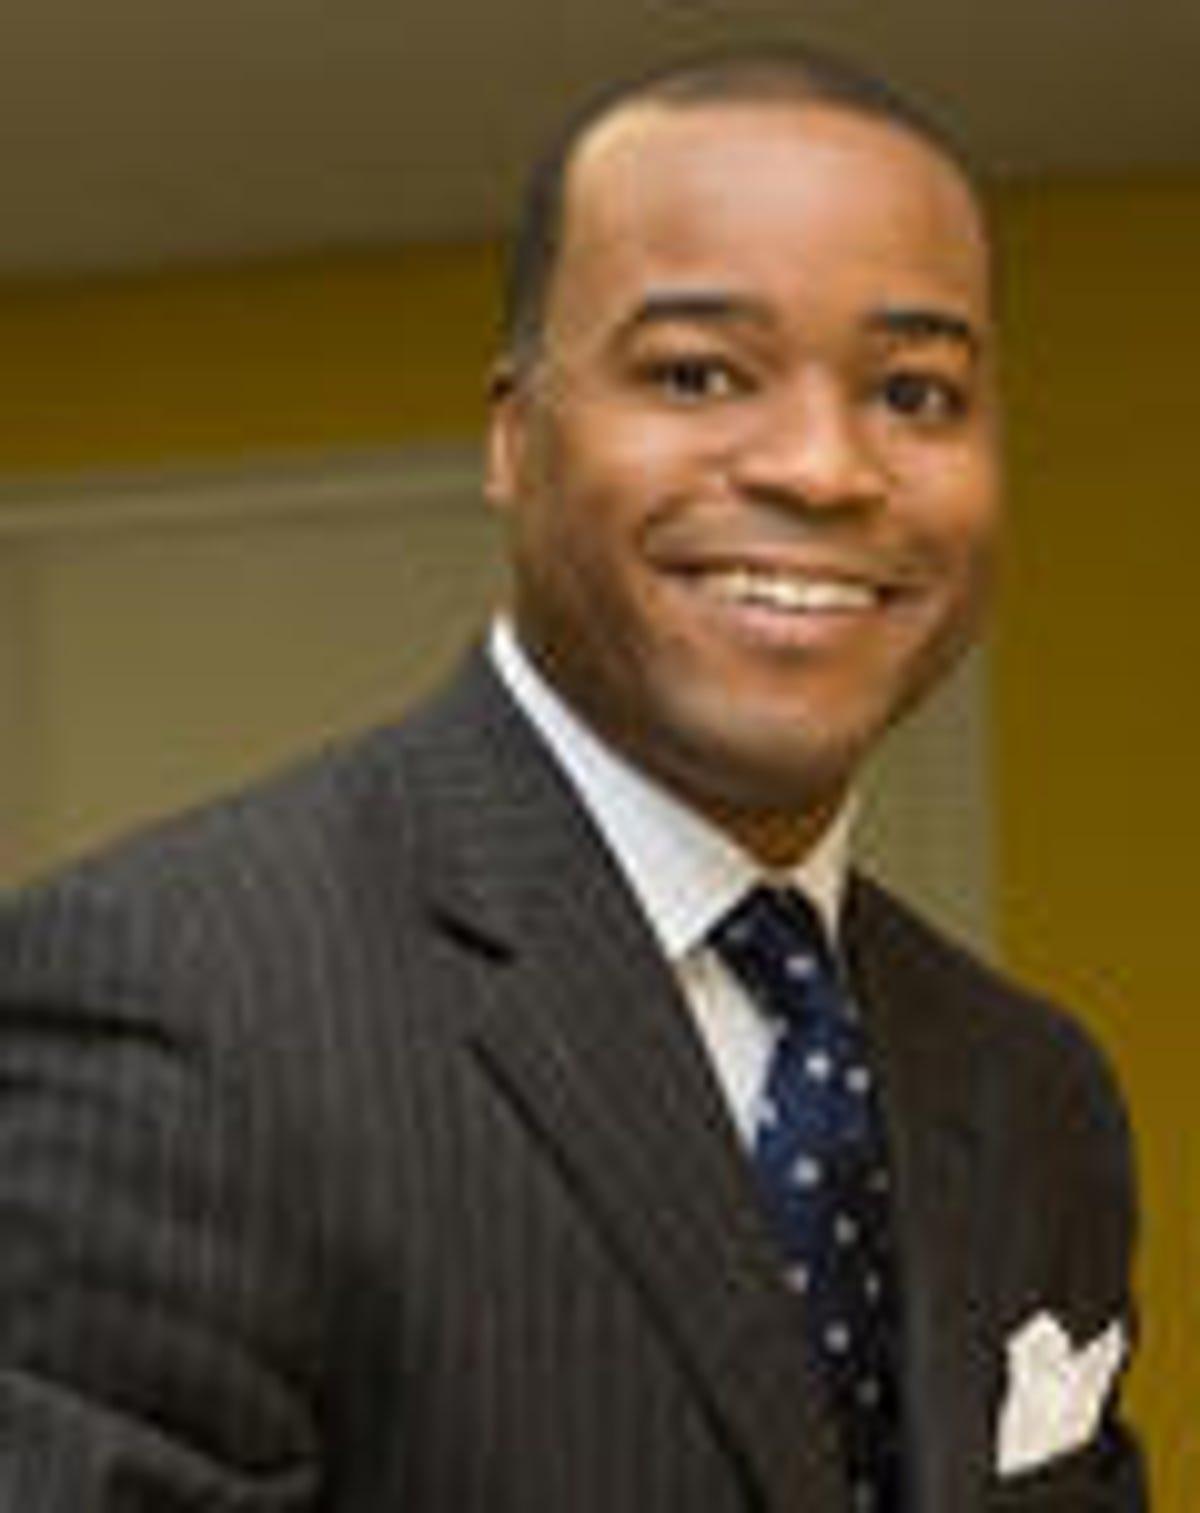 Judge Olu Stevens slams victims for tot's 'black men' fear